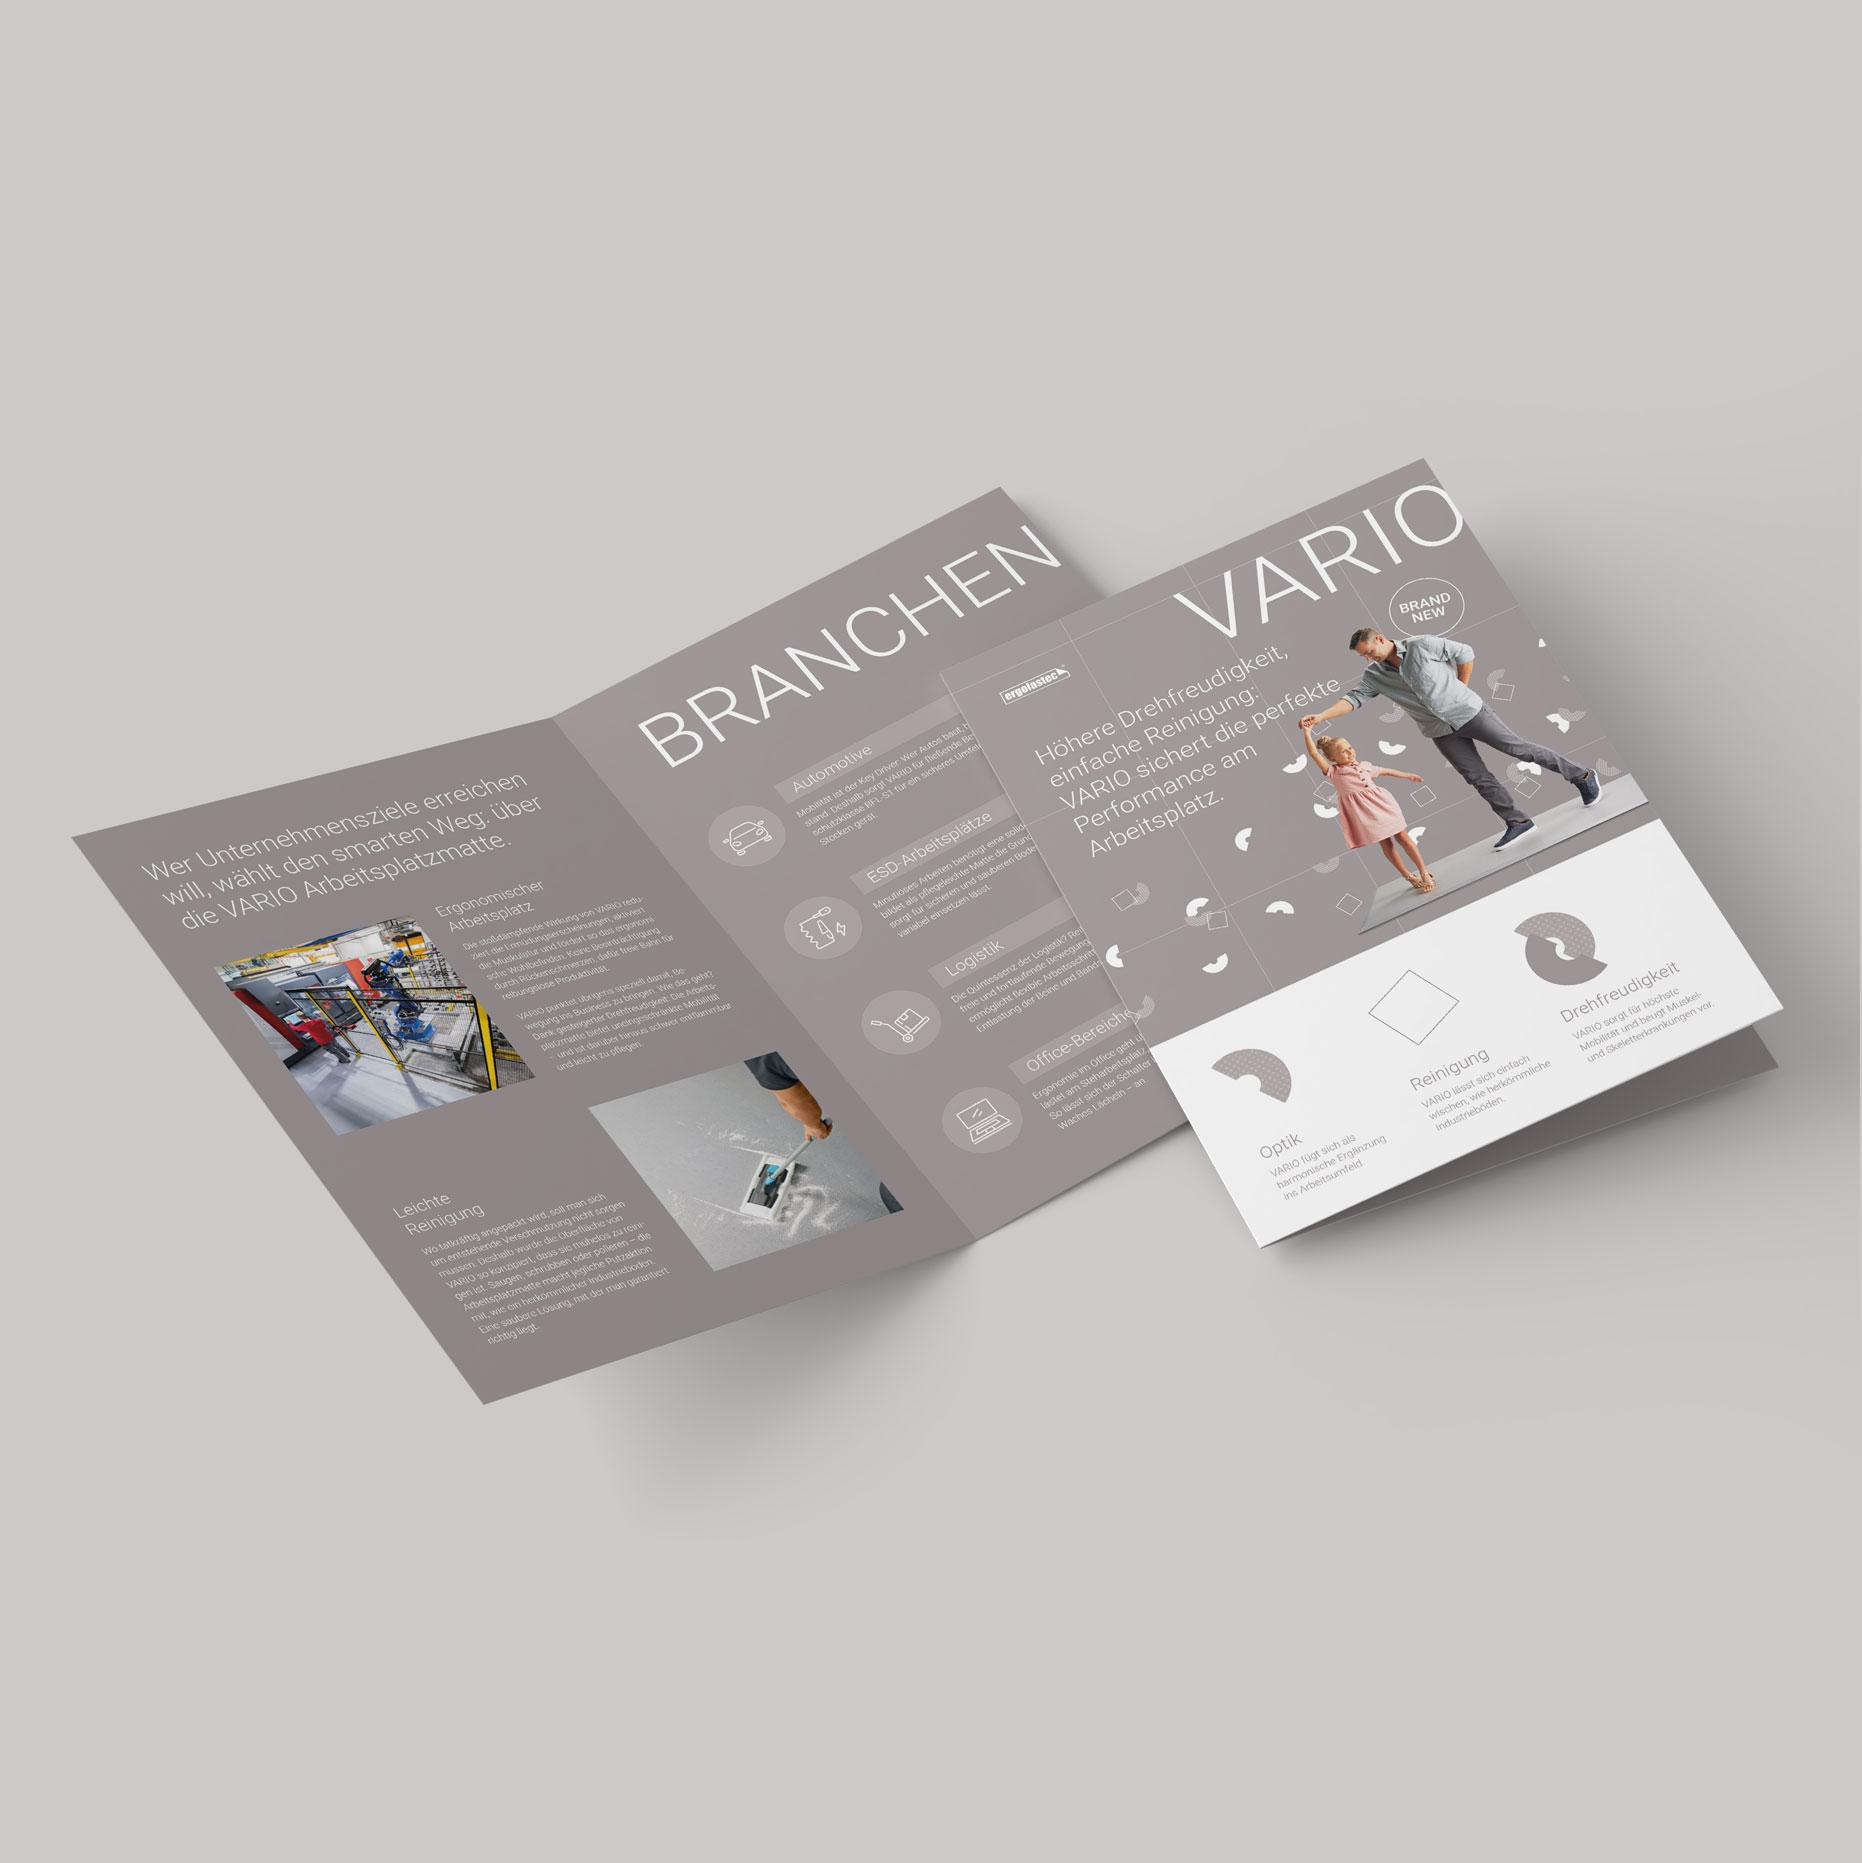 Q2 Werbeagentur, Kraiburg Matting Systems Vario, Print